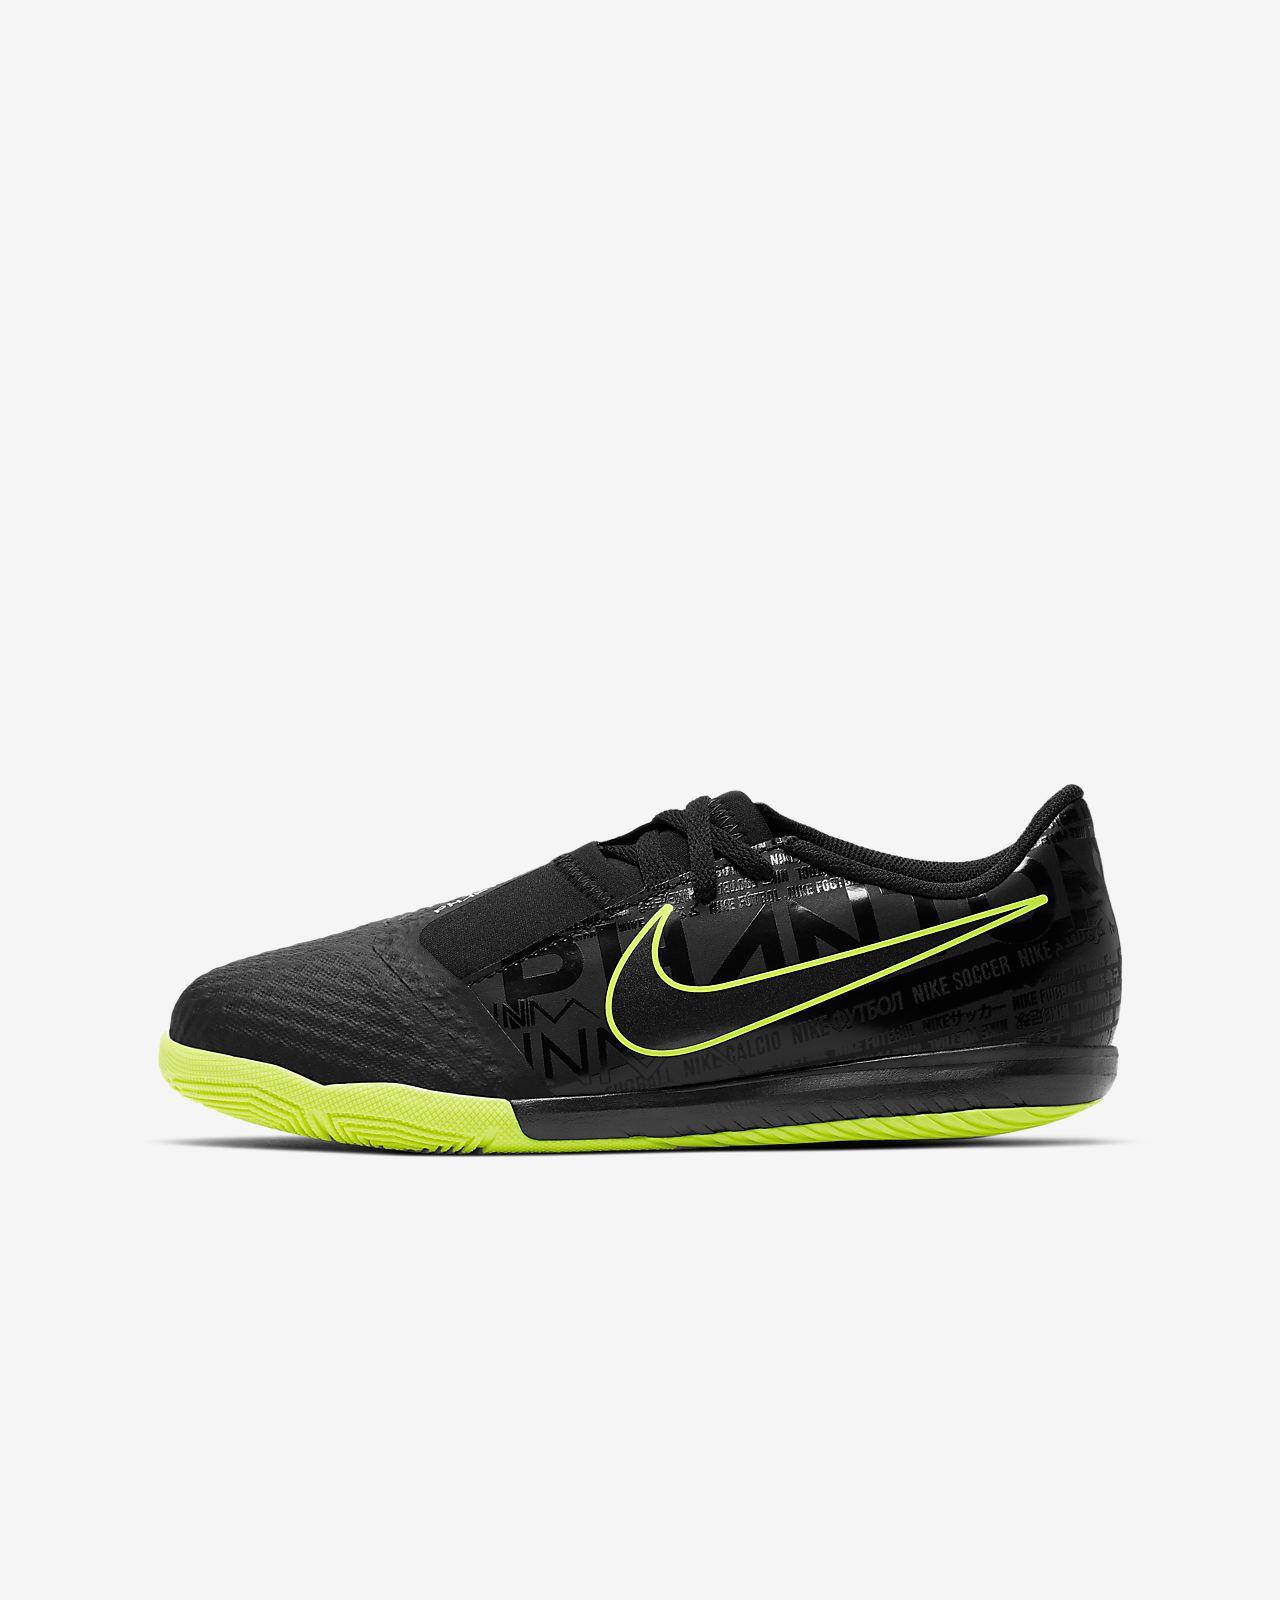 Scarpa da calcio per campi indoor/cemento Nike Jr. Phantom Venom Academy IC - Ragazzi